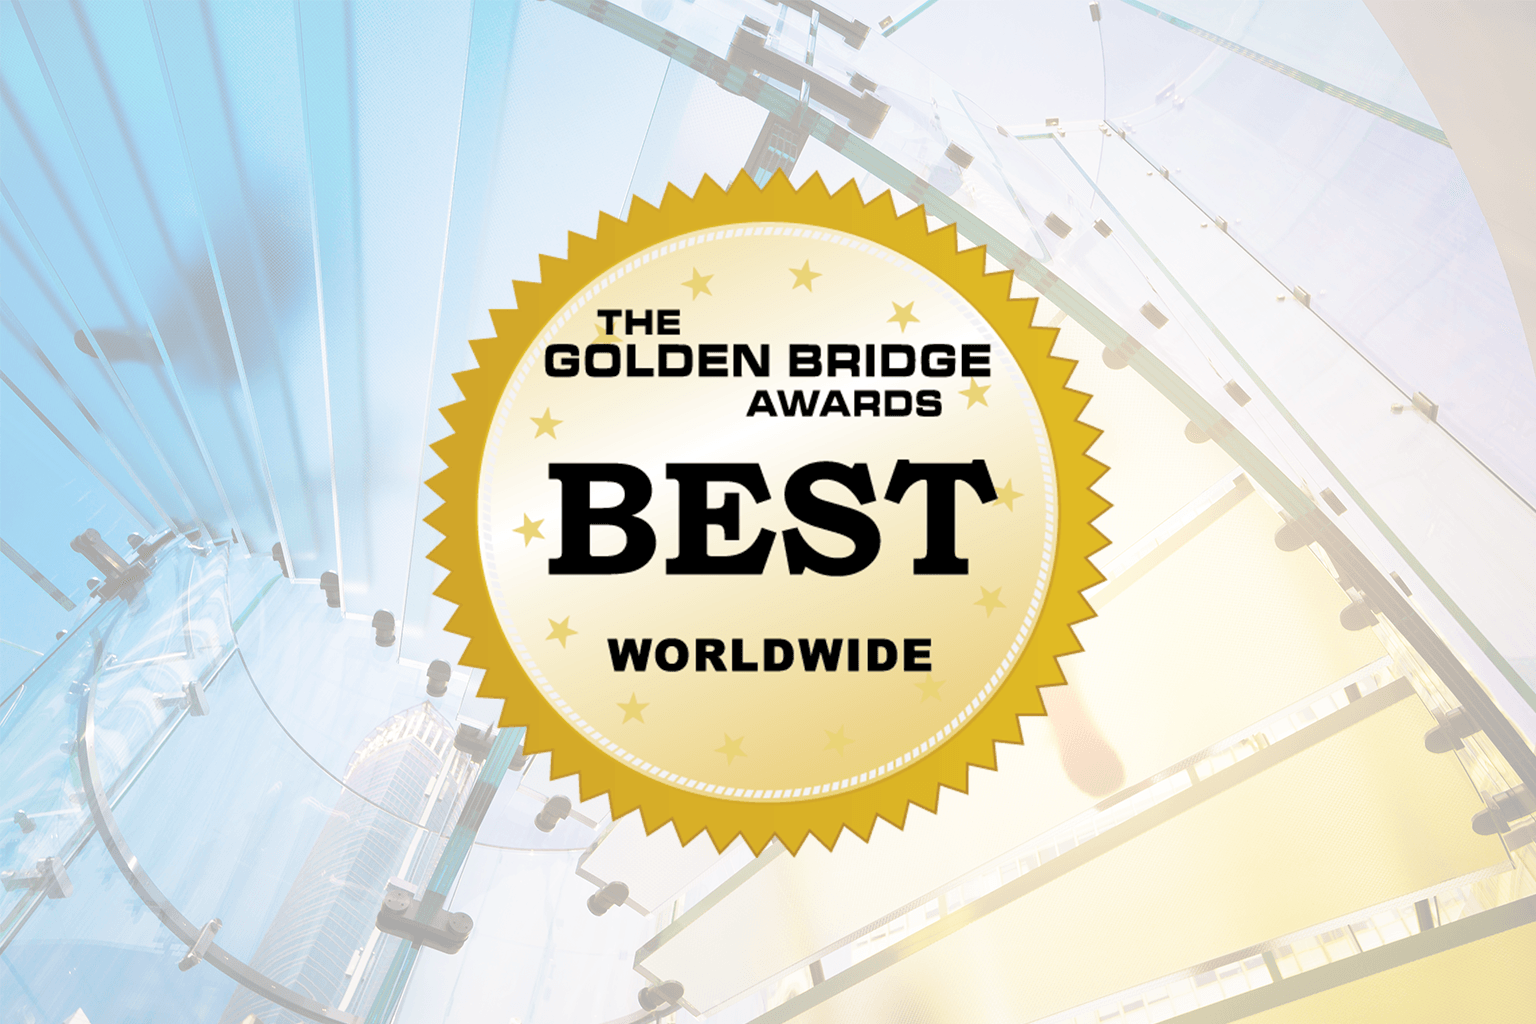 The Golden Bridge Awards Best Worldwide